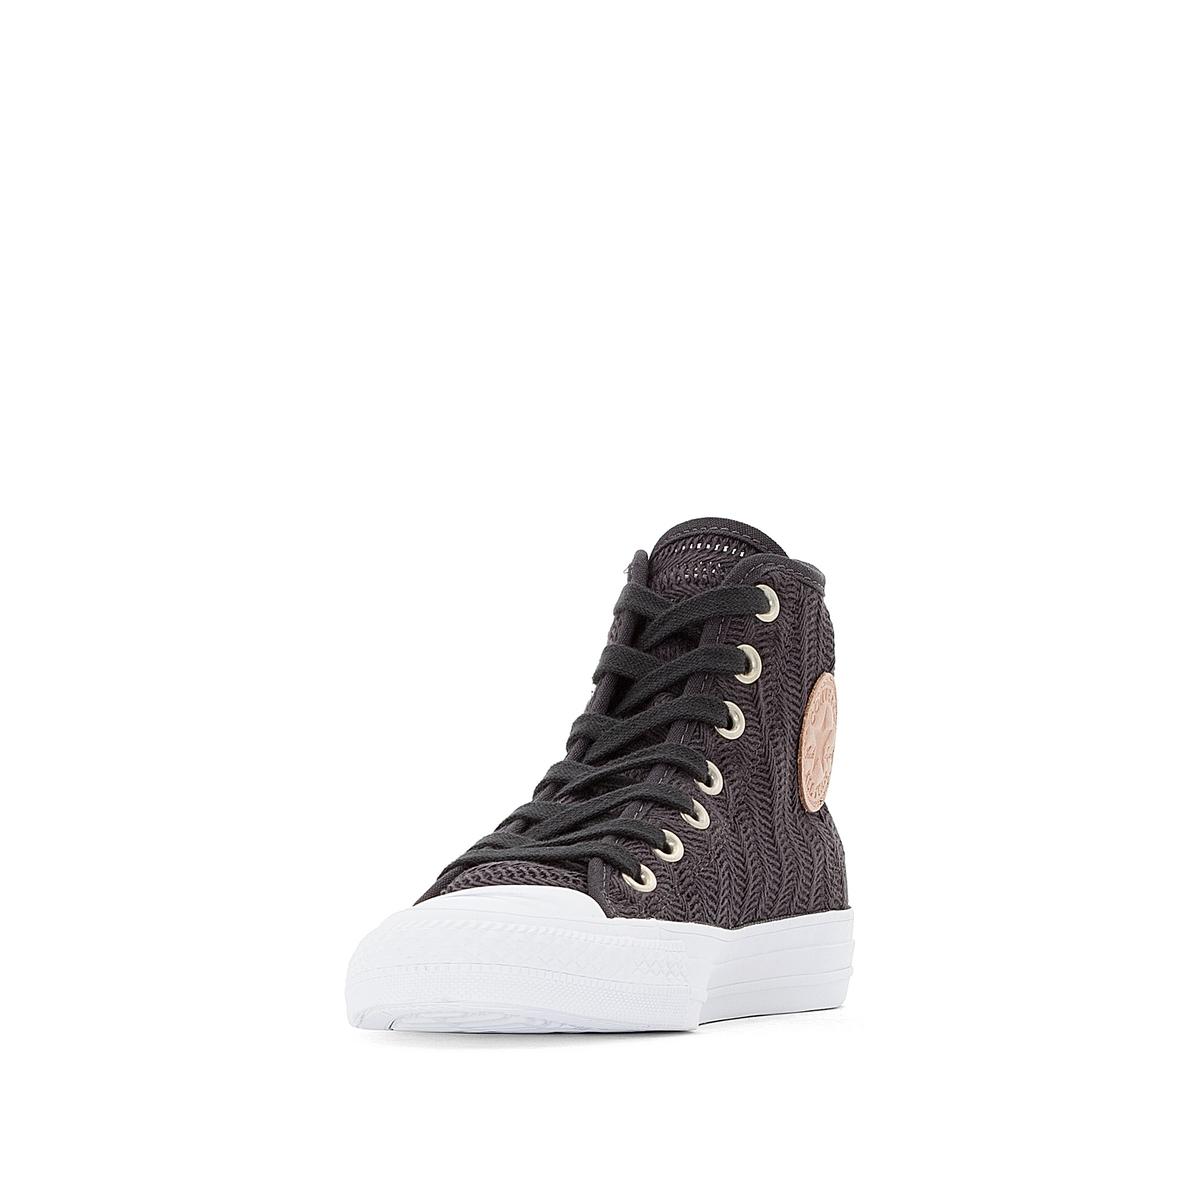 Imagen secundaria de producto de Zapatillas de caña alta CTAS HERRINGBONE MESH - Converse